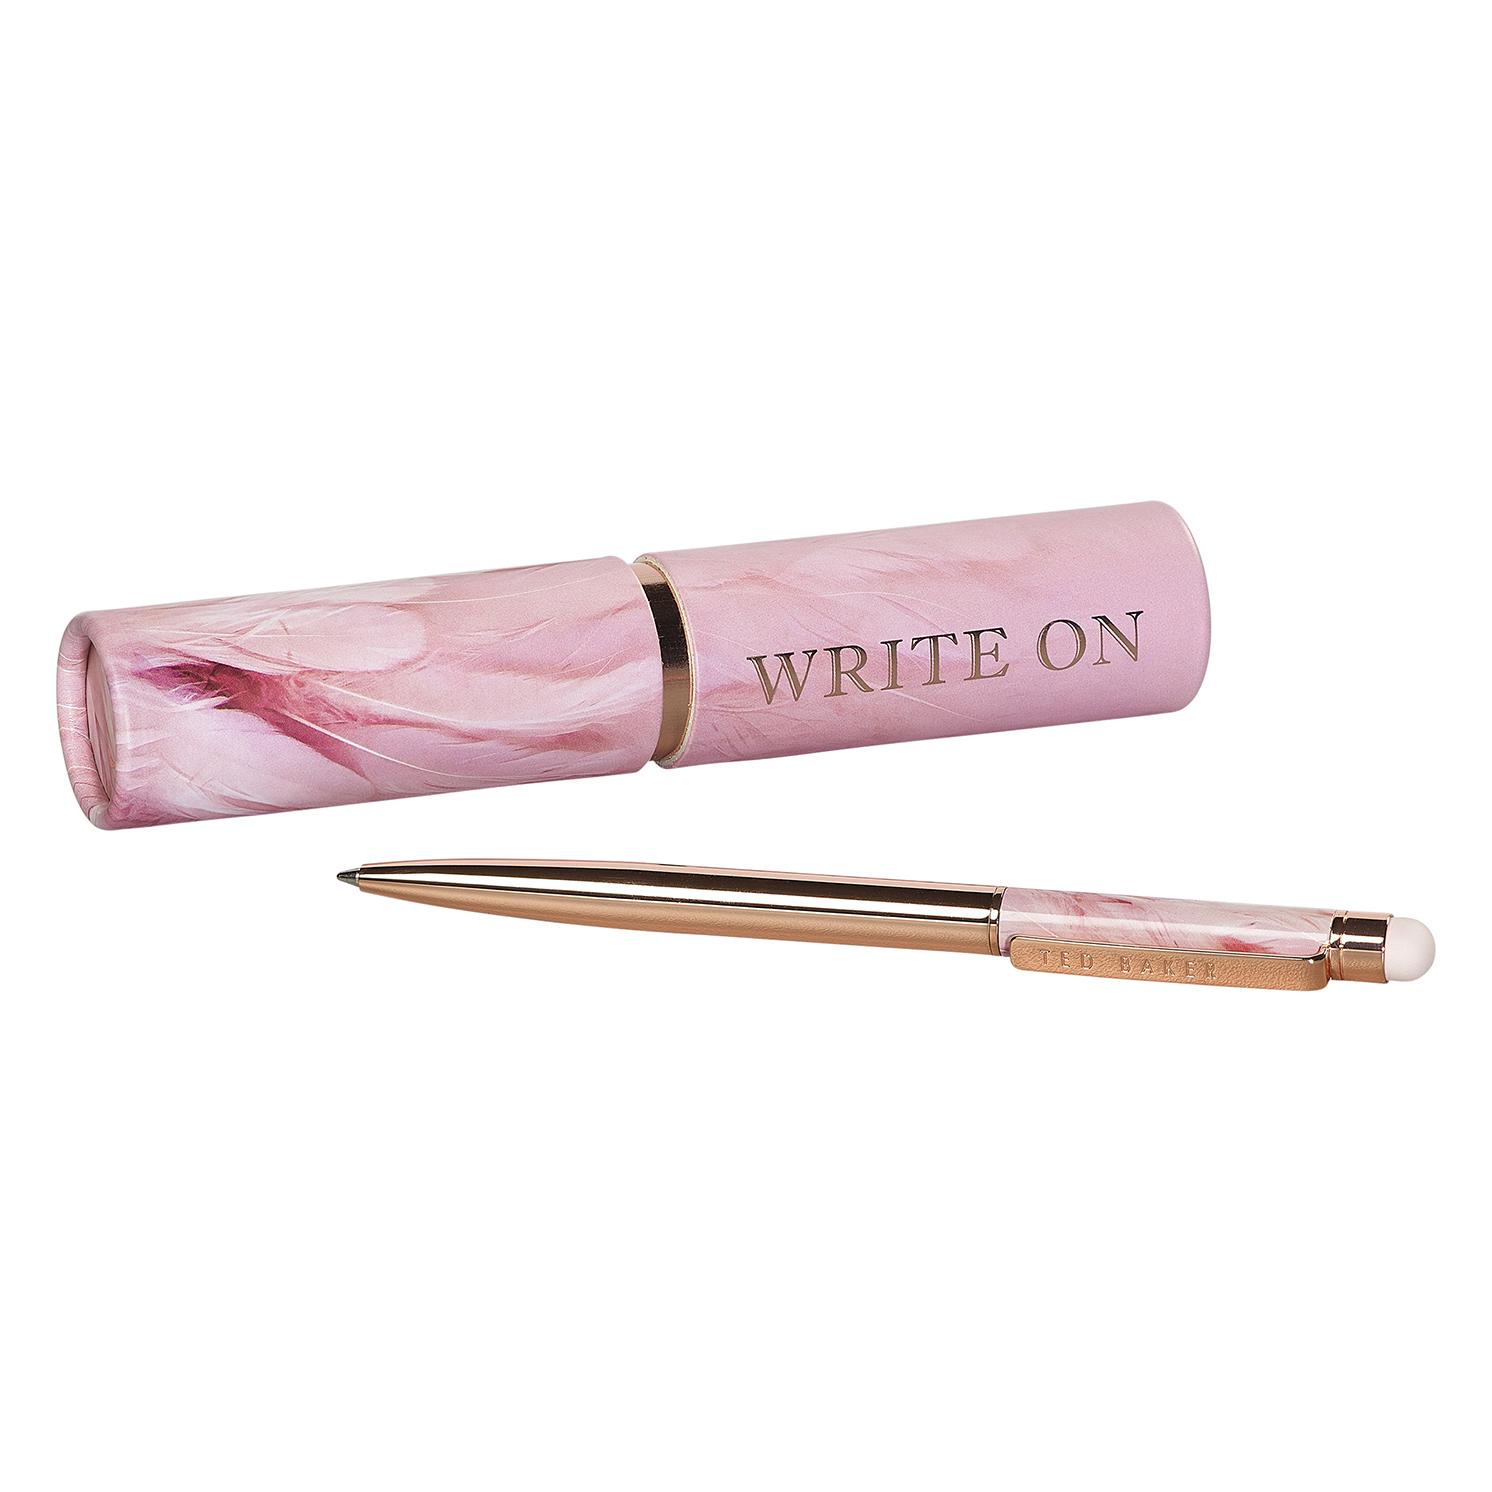 Ted Baker – Pink Angel Falls Touchscreen Pen in Matching Pink Tubular Box